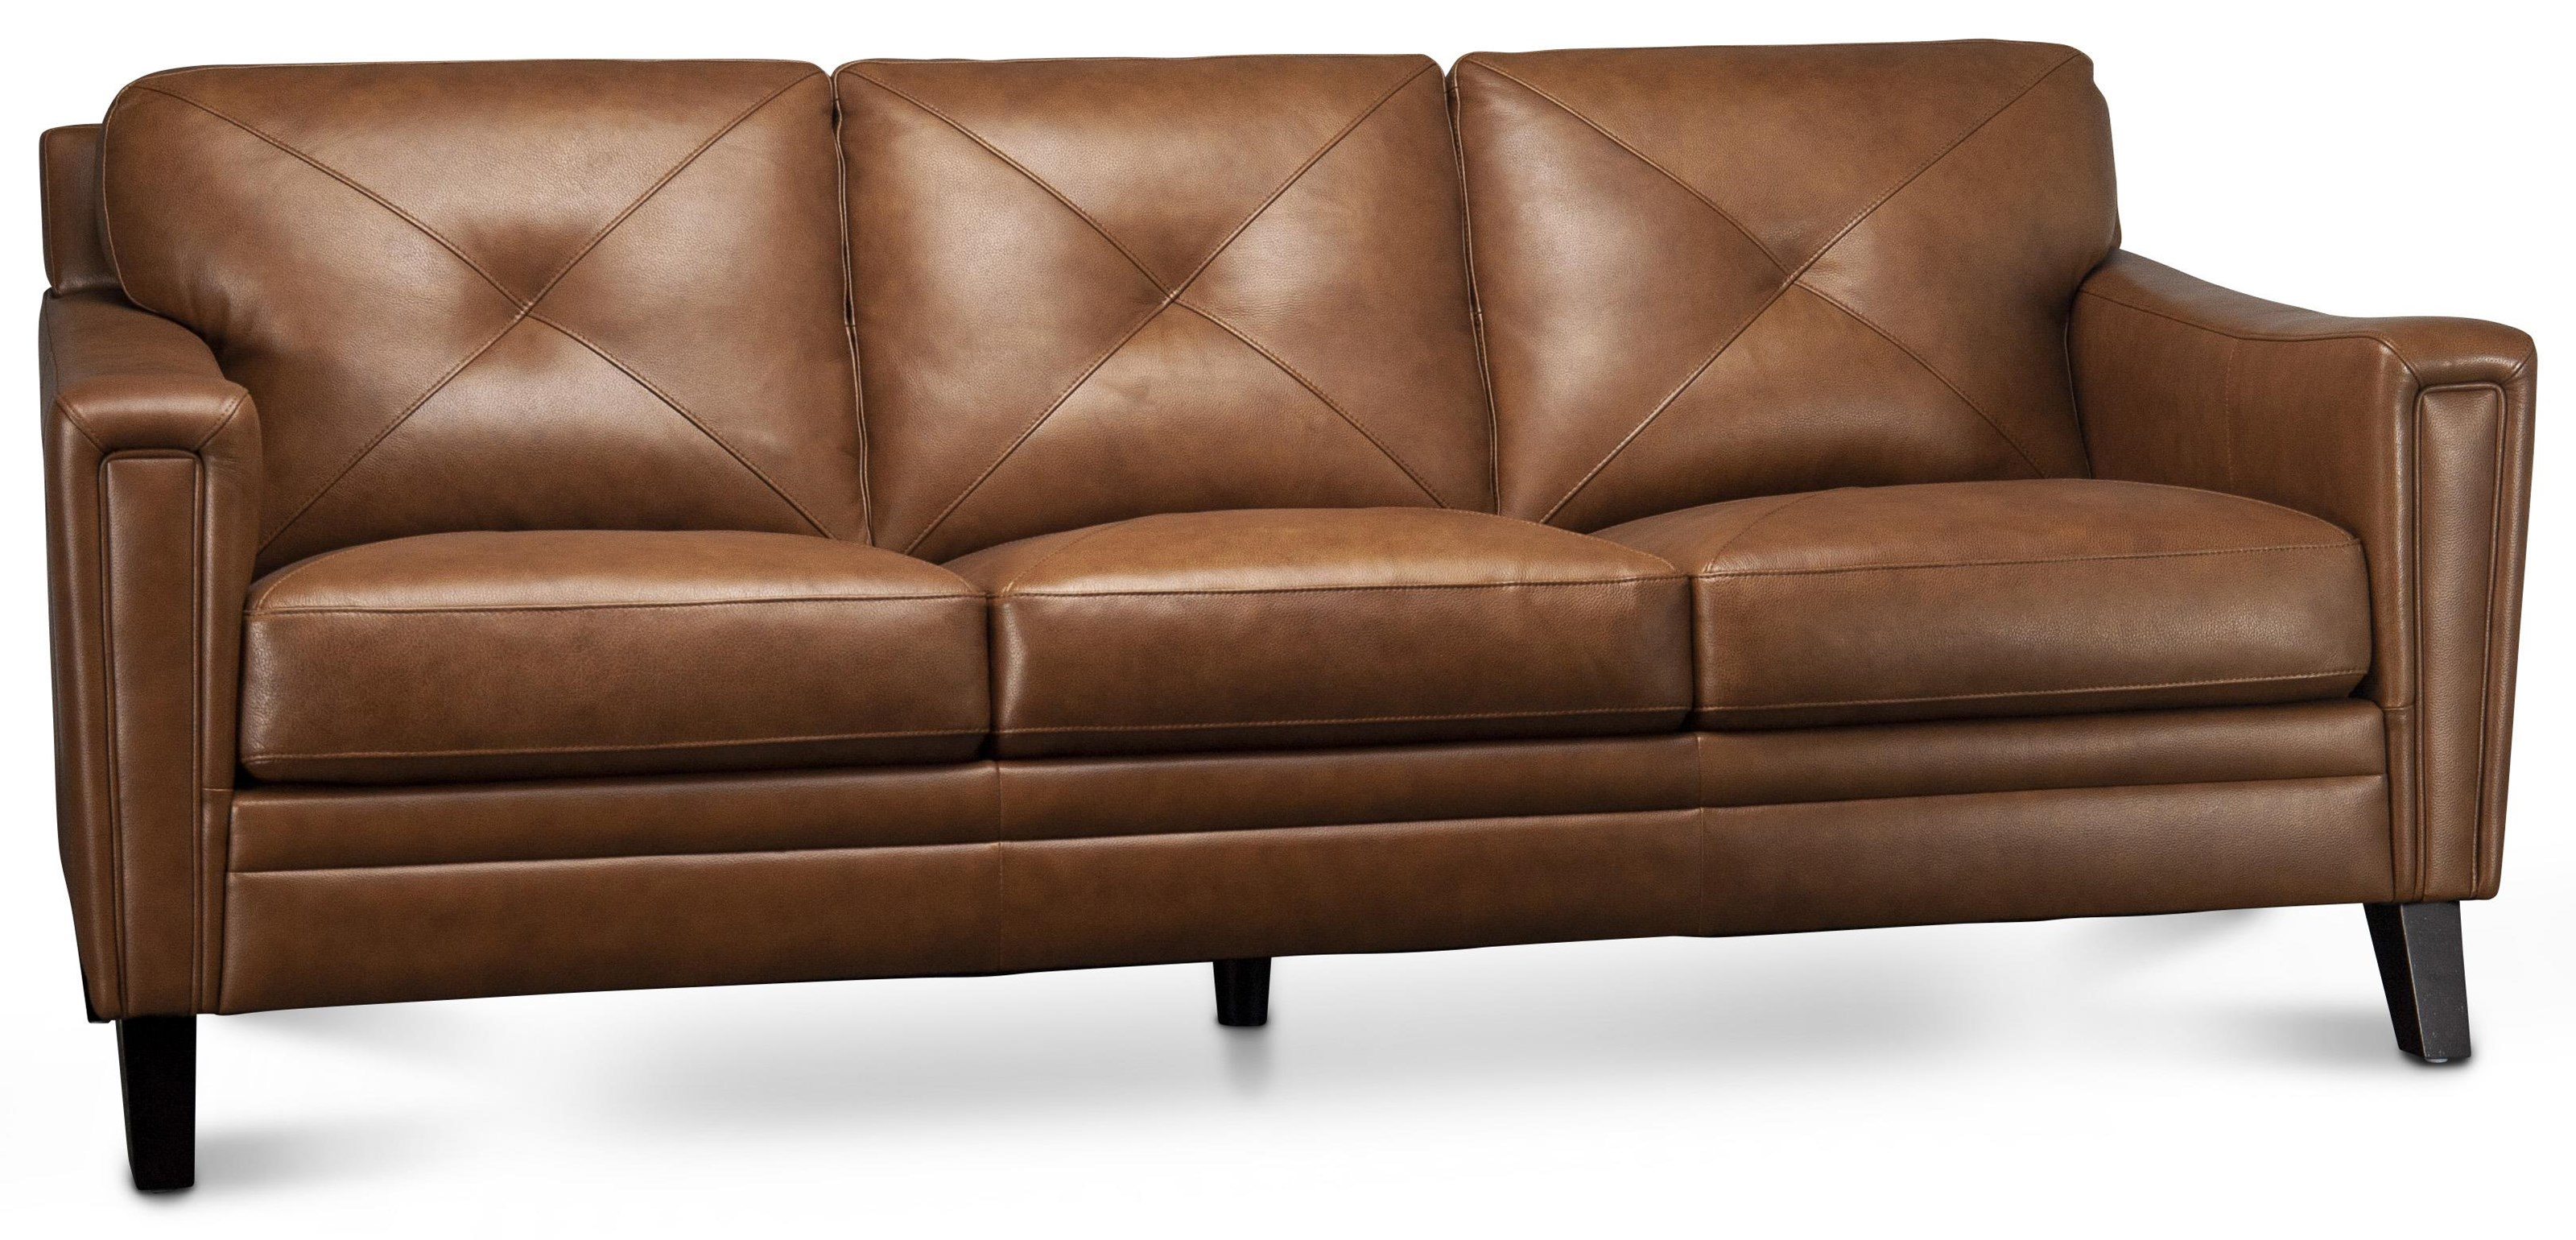 Wren Wren Leather Match Sofa by Abbyson at Morris Home